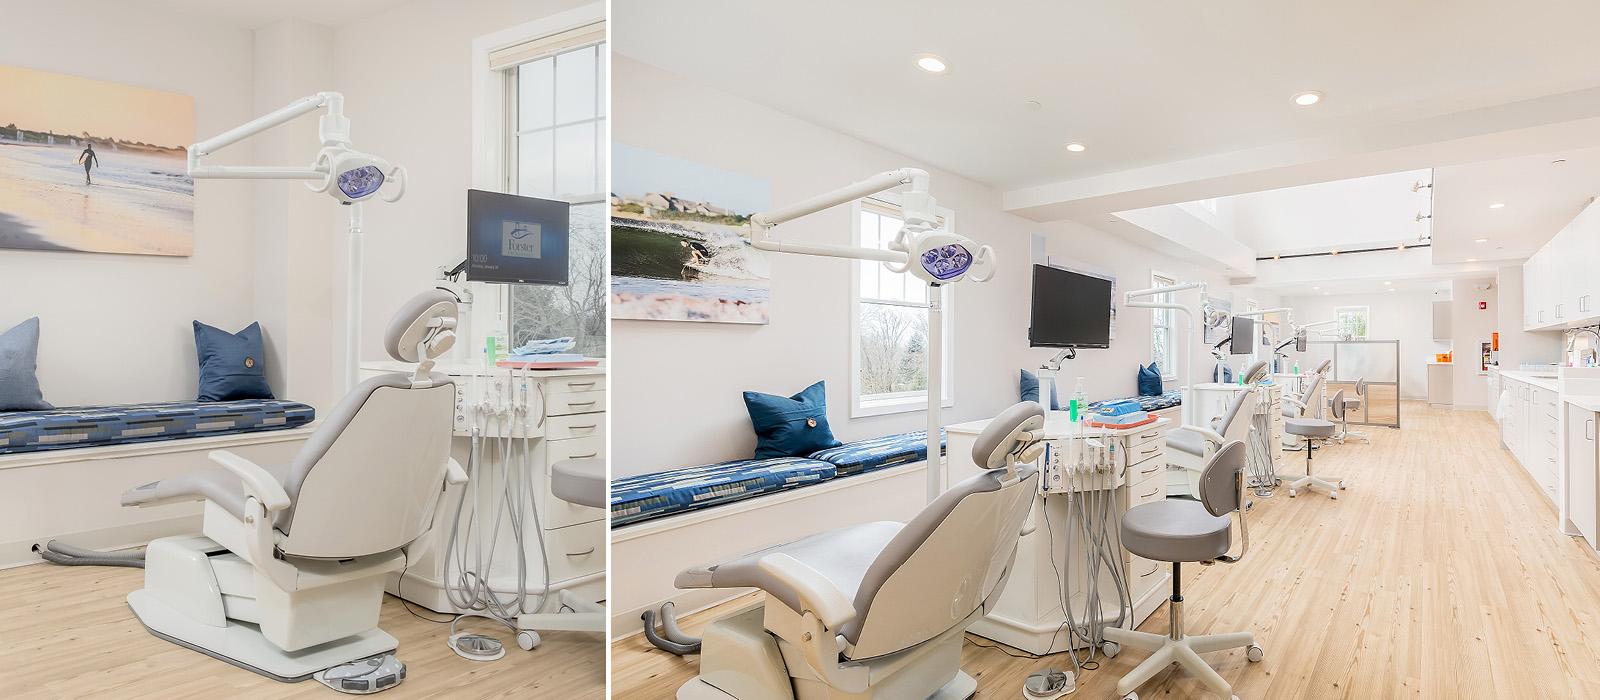 Forster Orthodontics treatment area